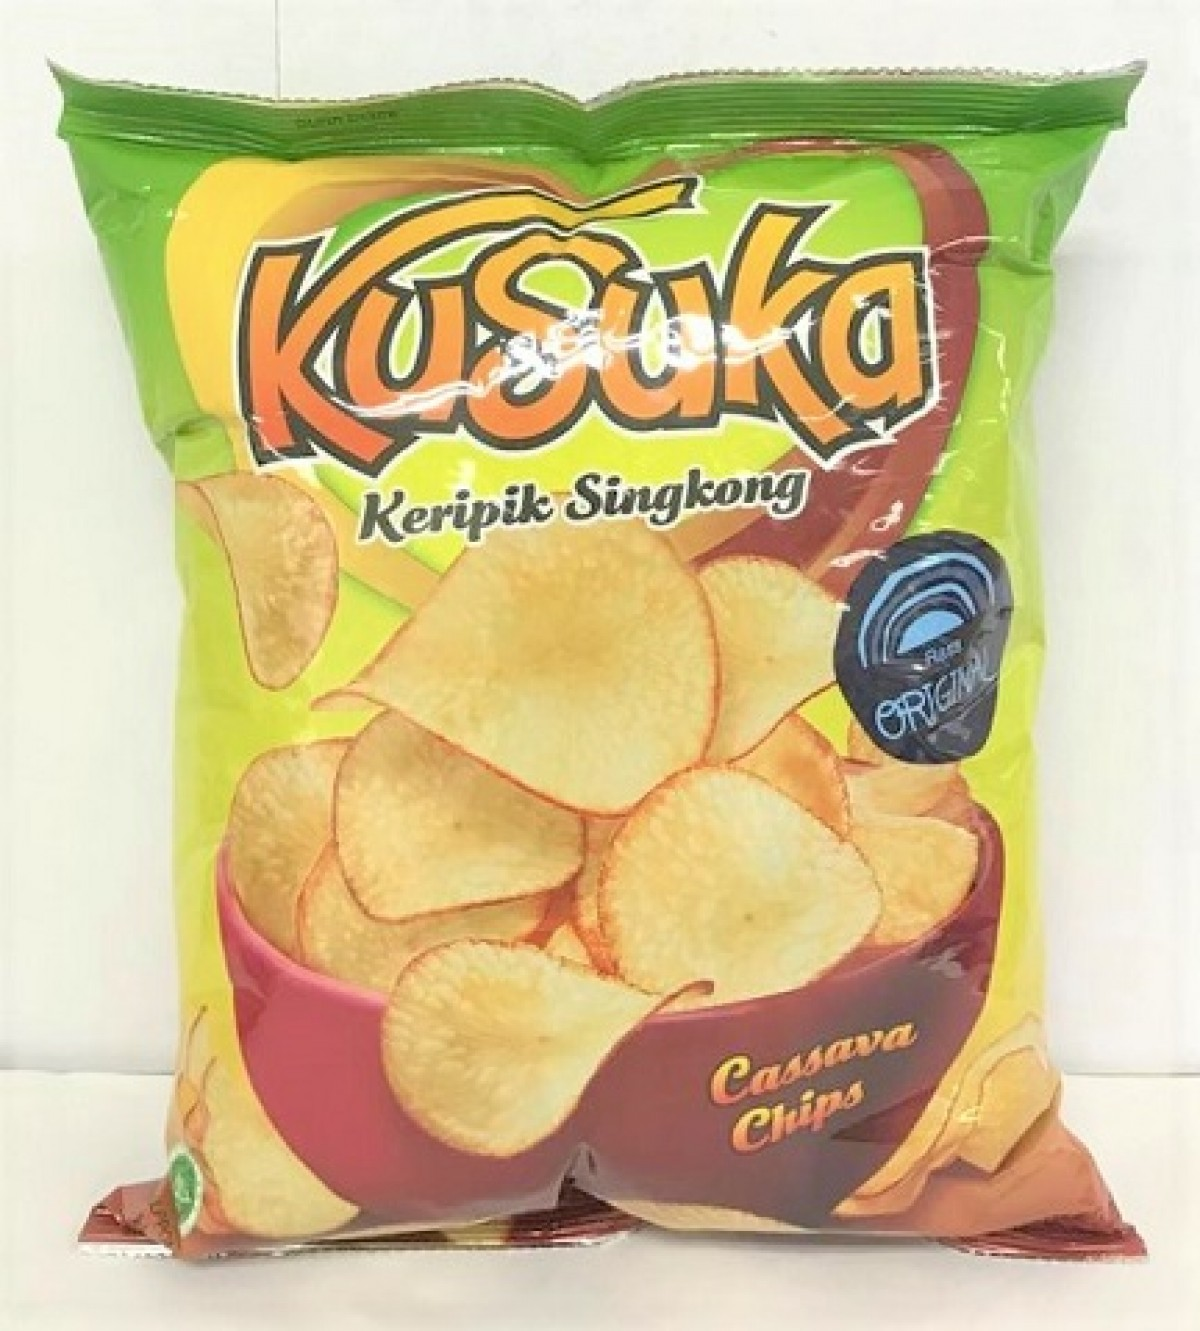 KUSUKA CASSAVA CHIPS - ORIGINAL 180G - Kanpeki